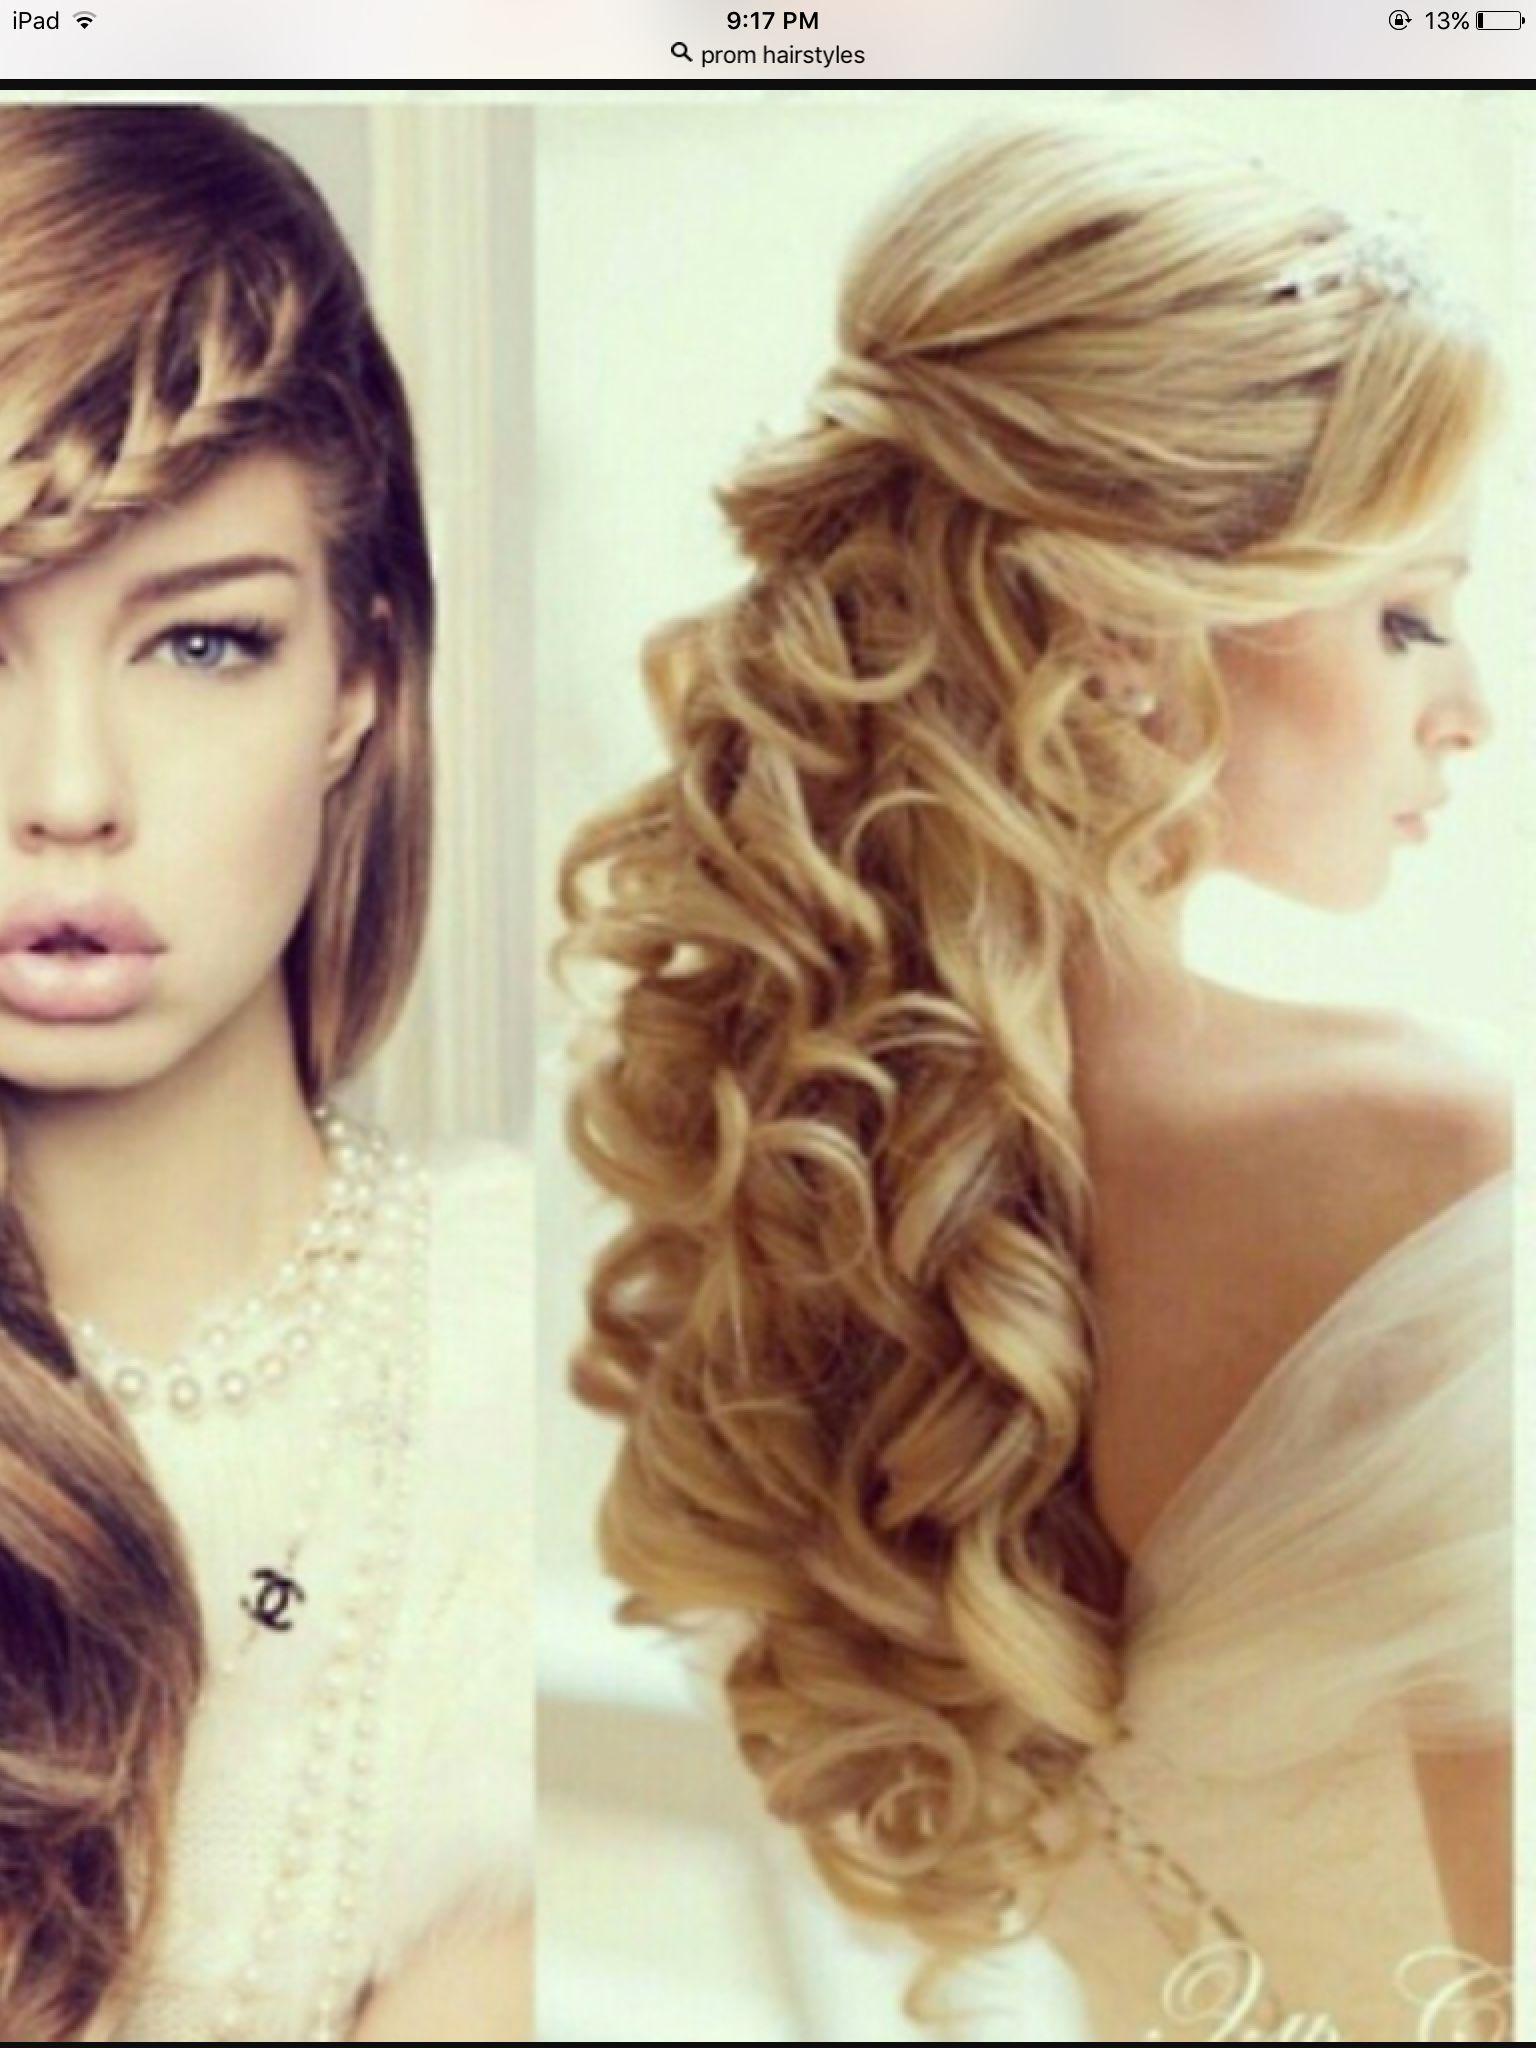 More hair formal dresses and hair pinterest hair style